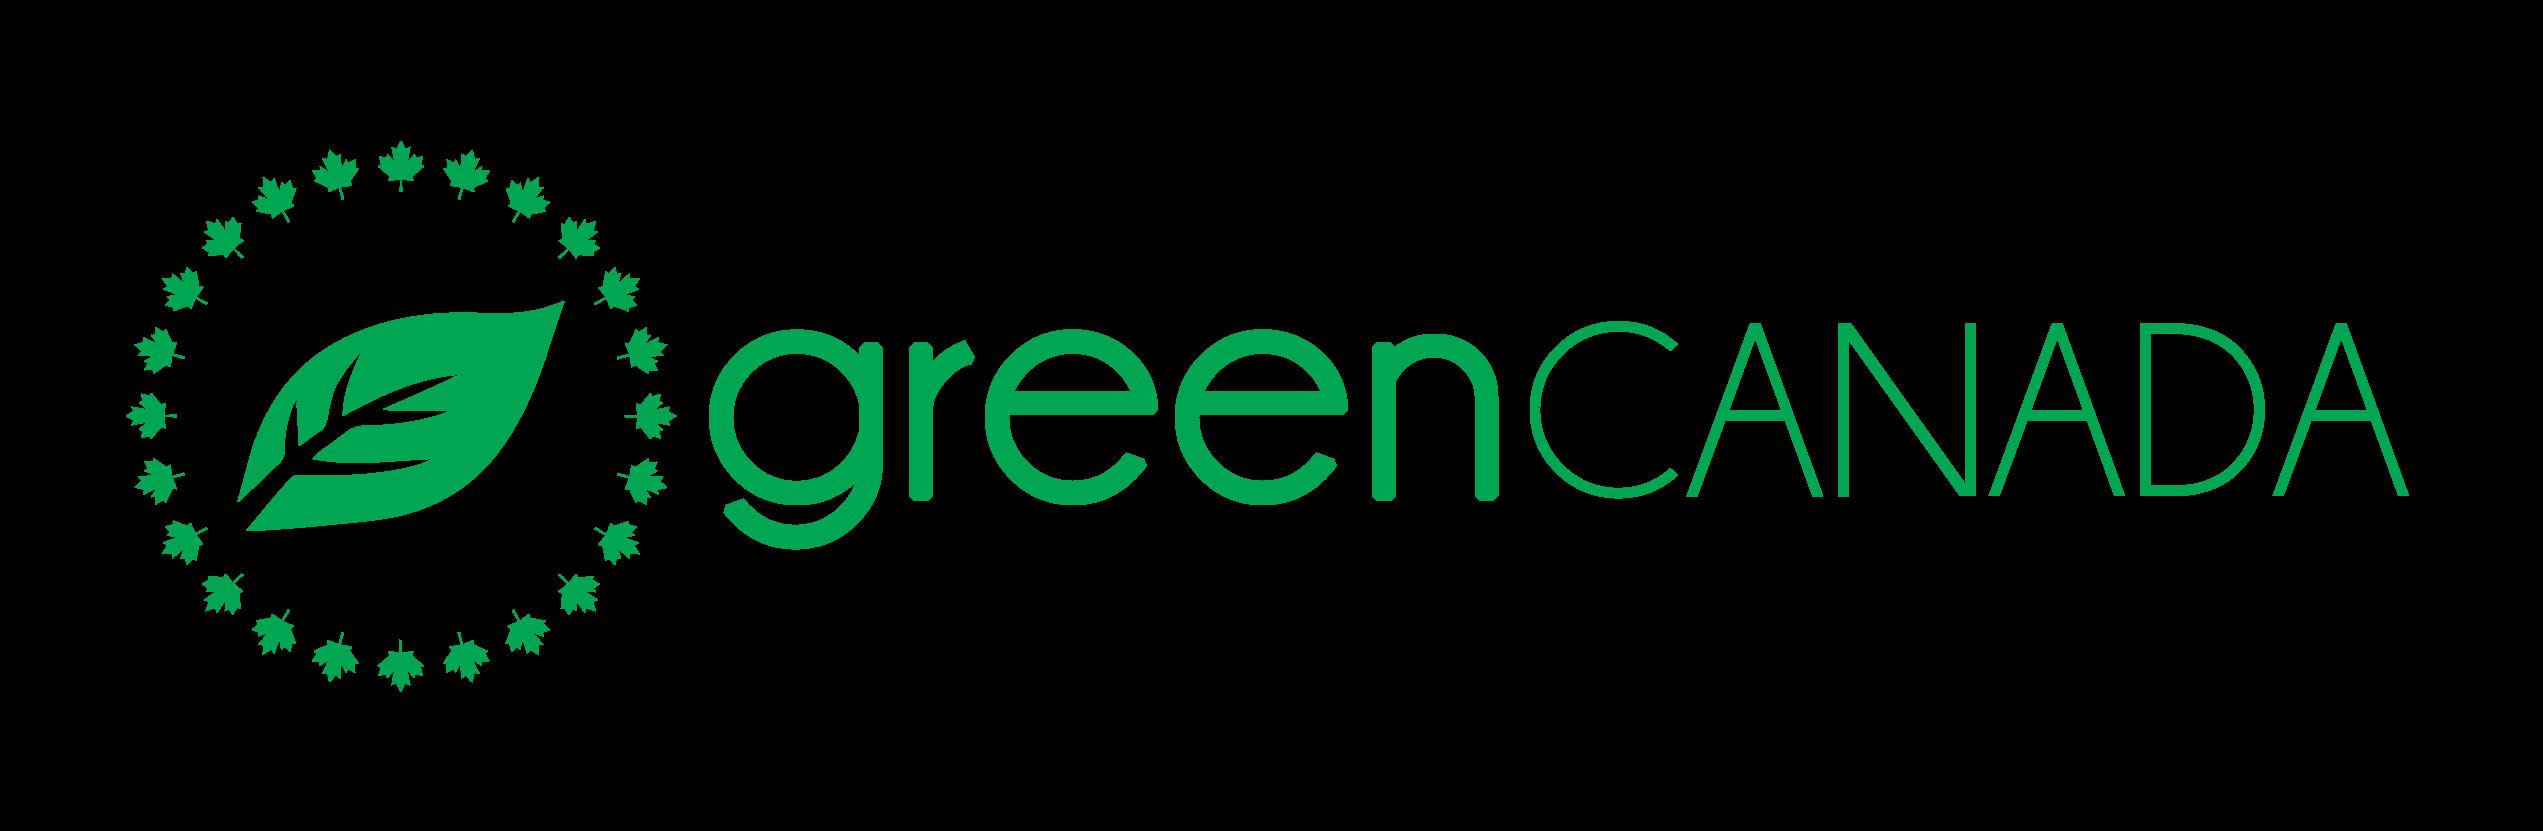 Green Canada Initiative by BestSports